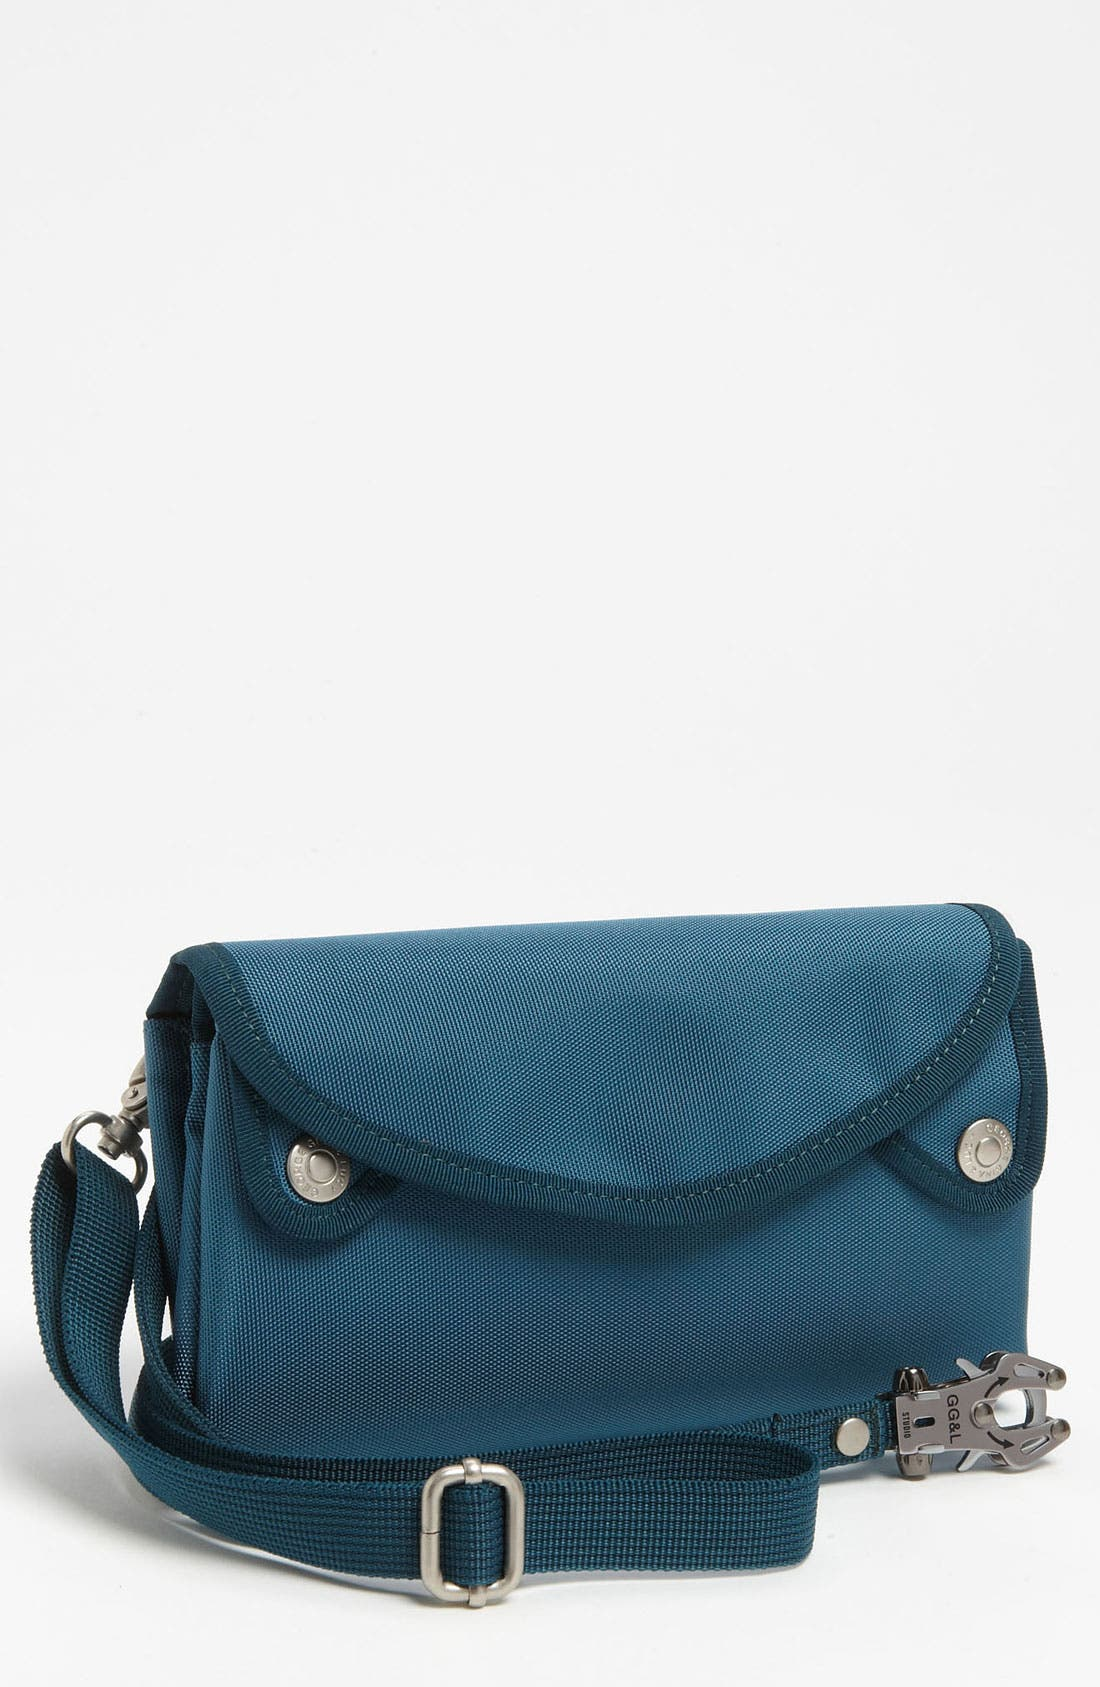 Main Image - George Gina & Lucy 'Hold & Fold' Bag